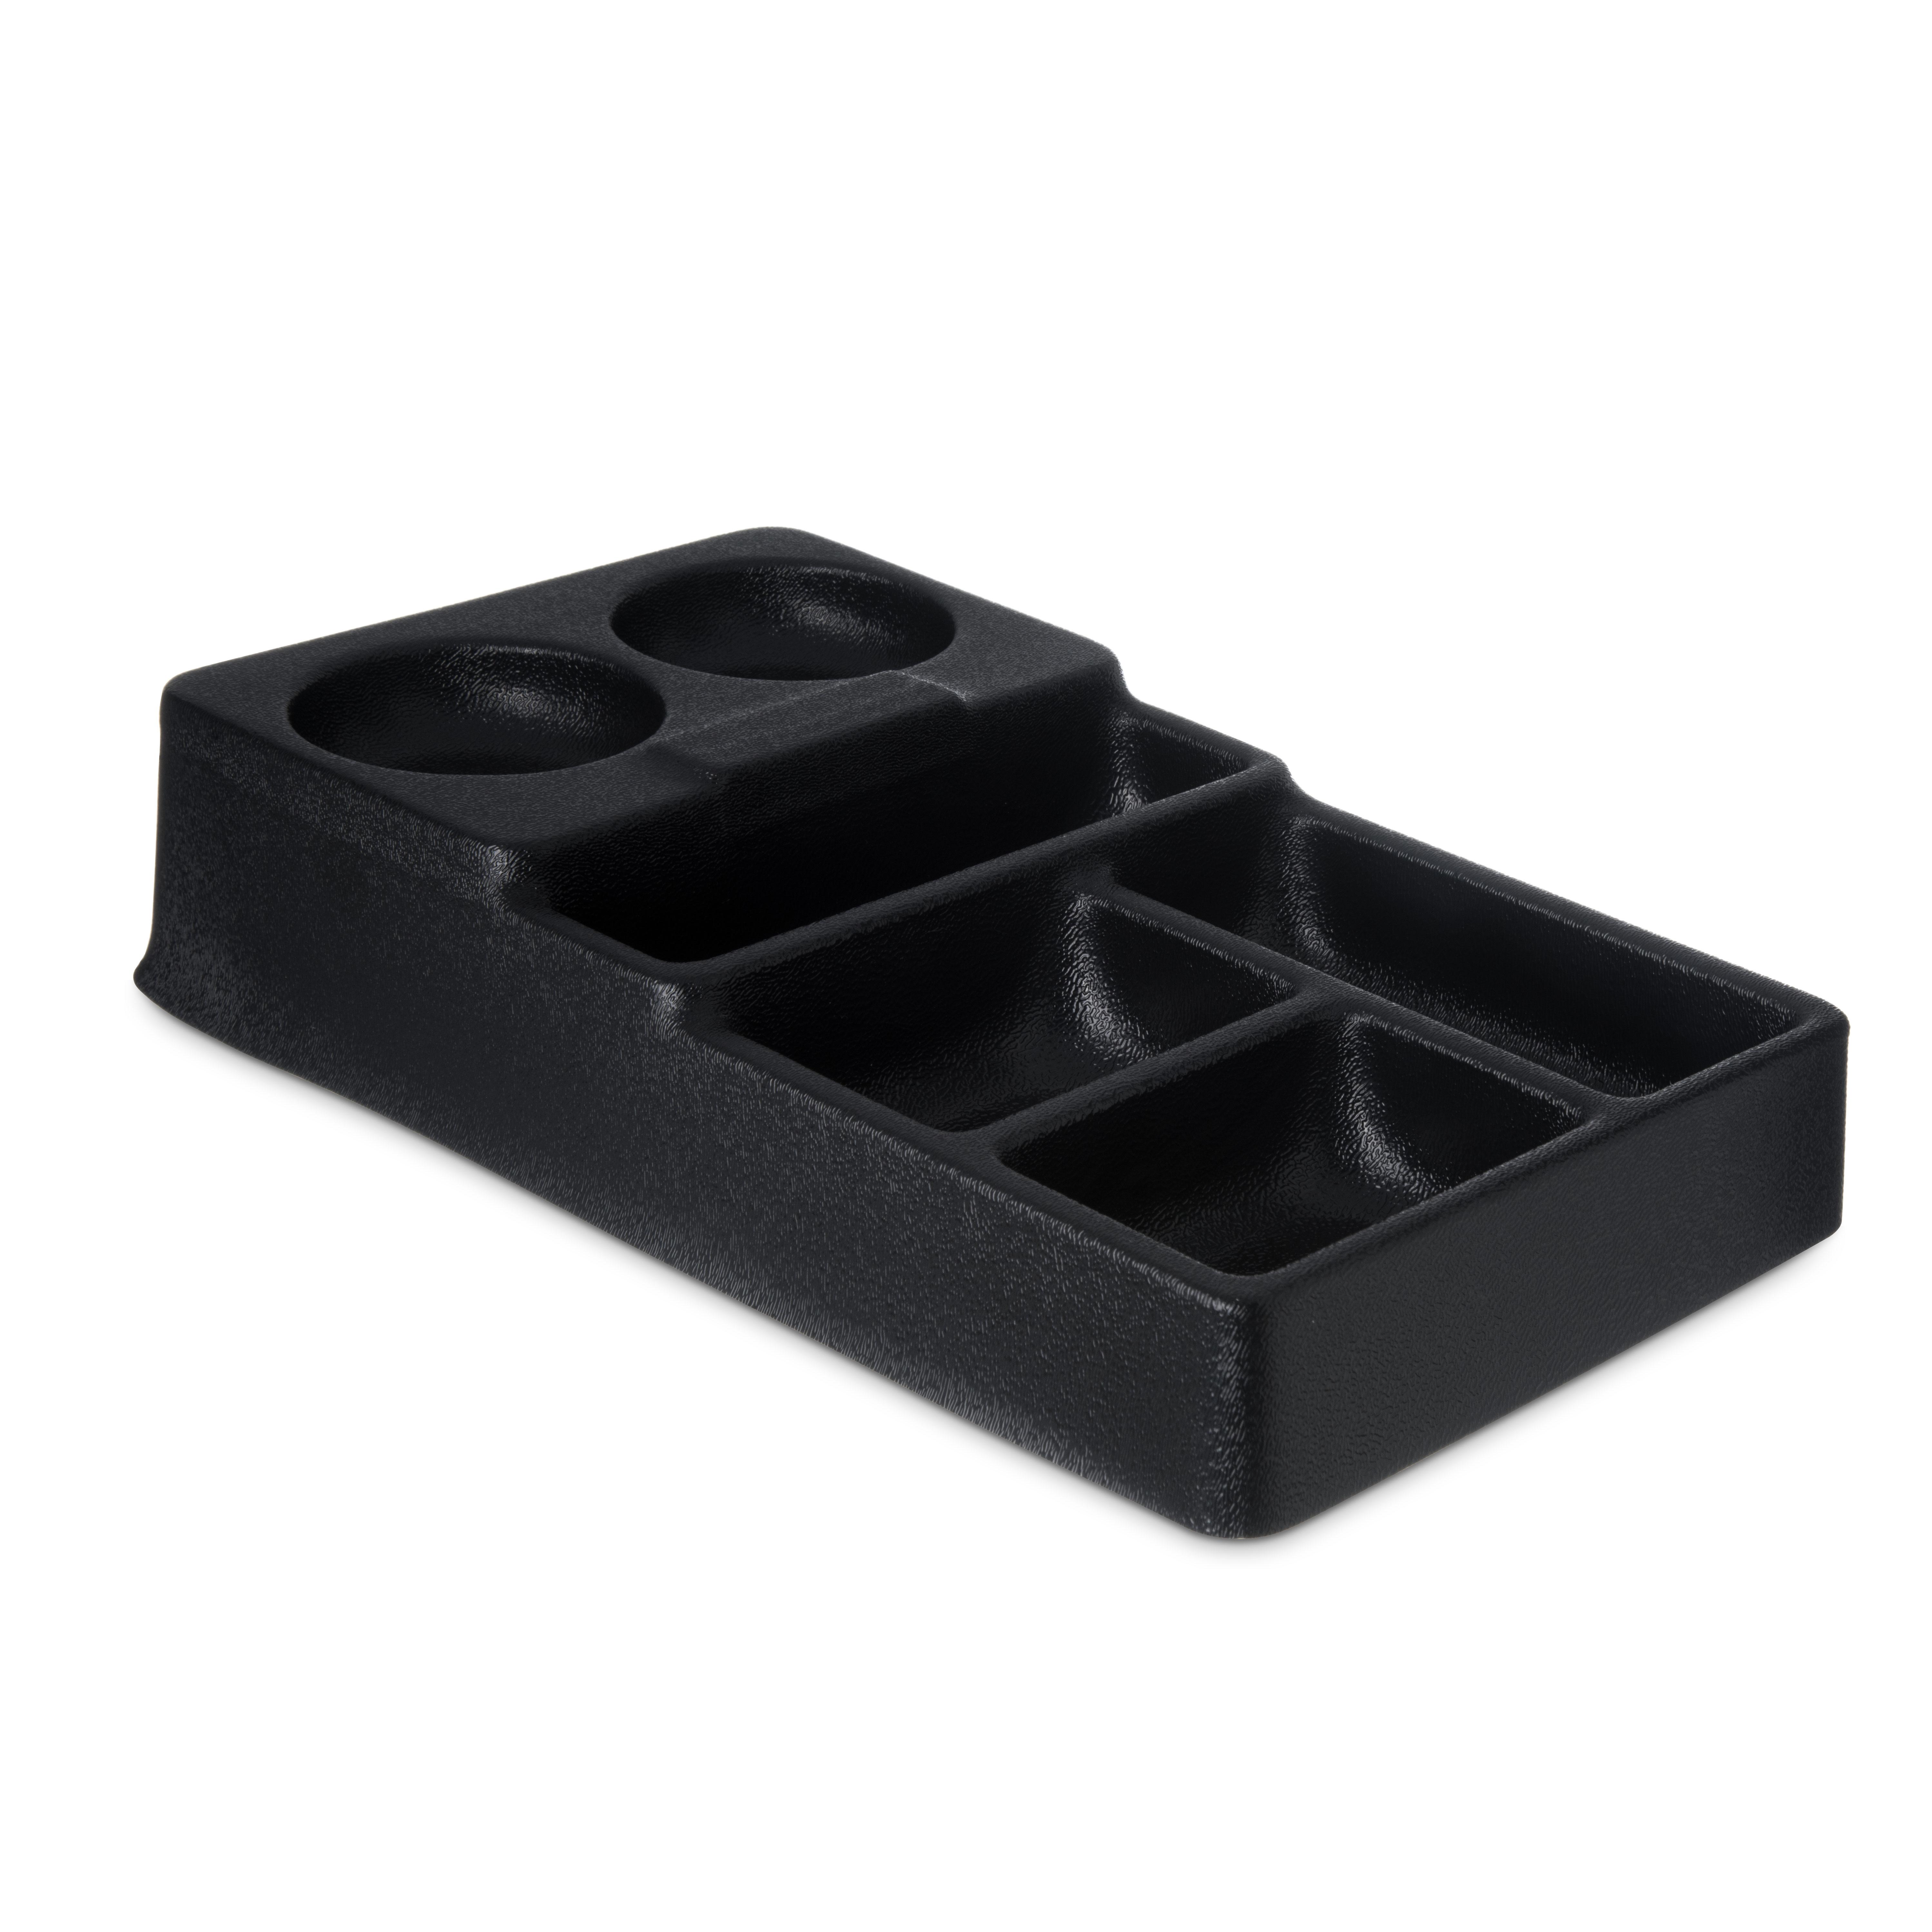 Carlisle 1082803 condiment caddy, countertop organizer